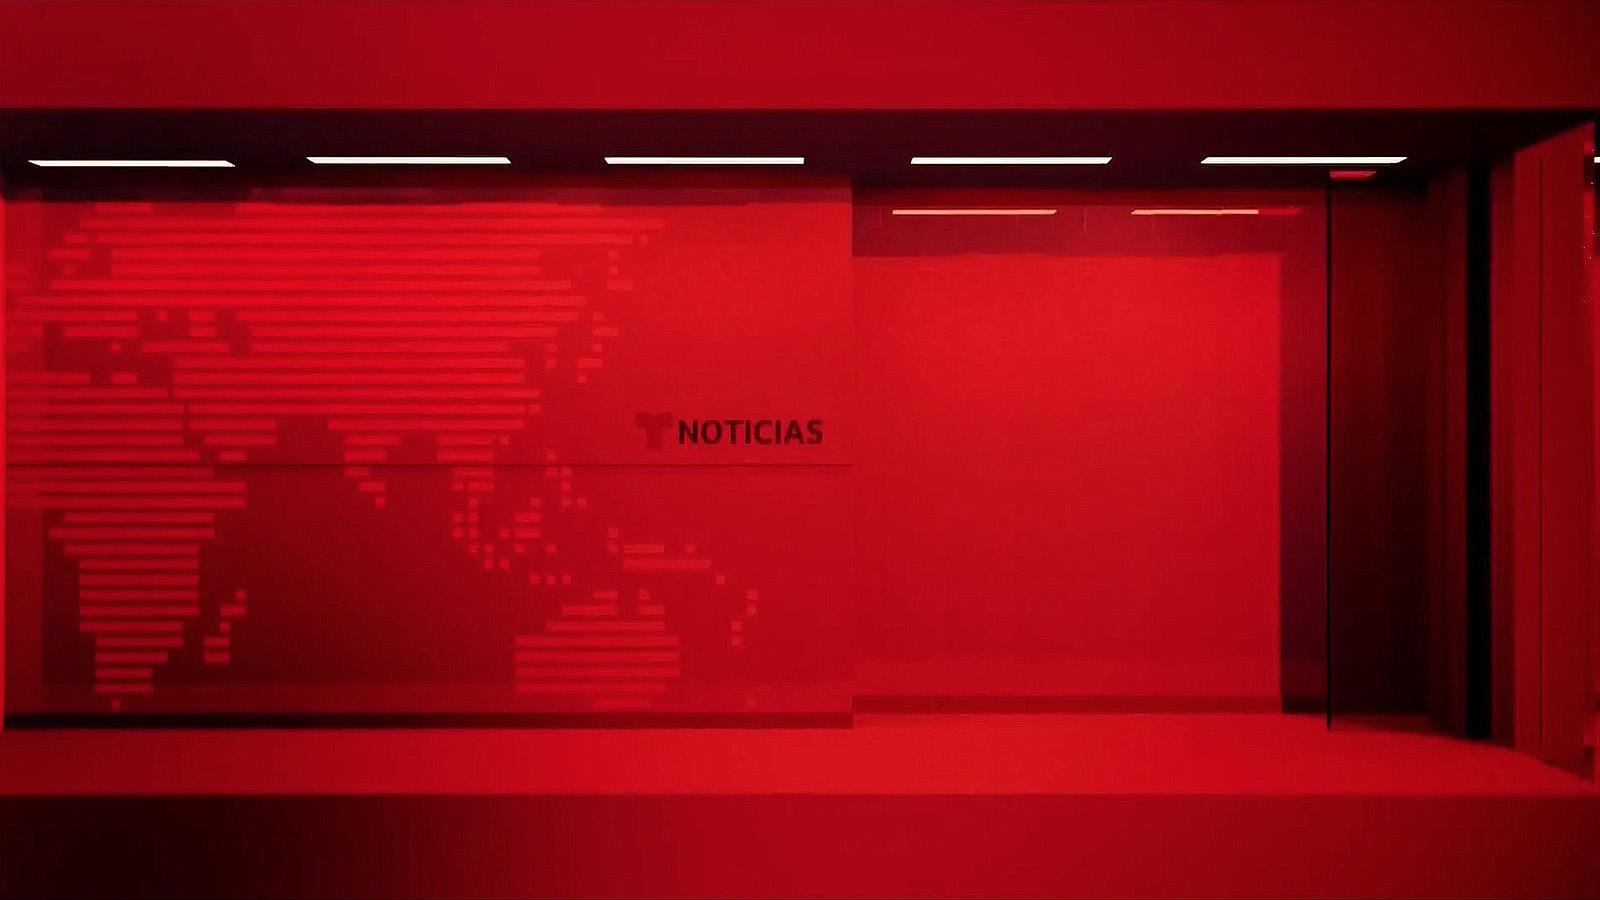 NCS_Noticias-Telemundo-Design_0002